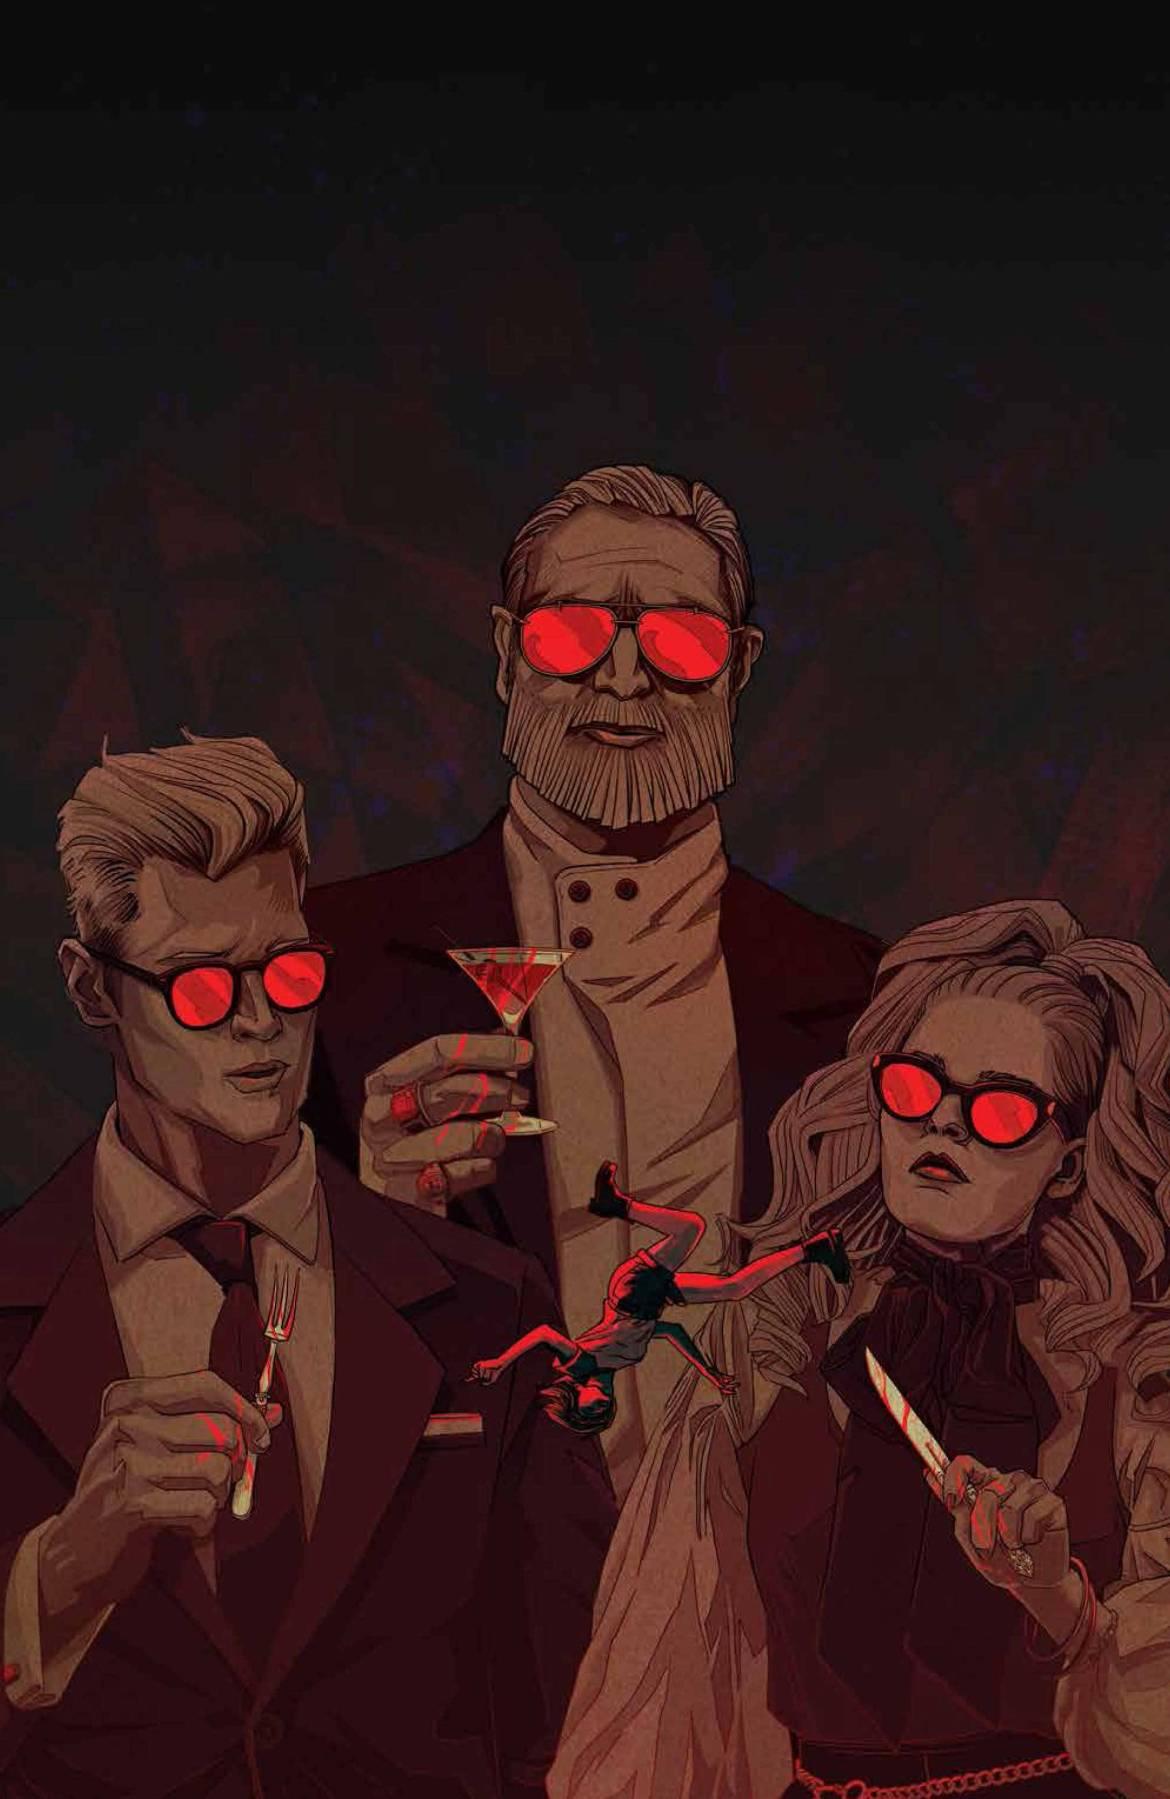 STL193843 ComicList: BOOM! Studios New Releases for 08/18/2021